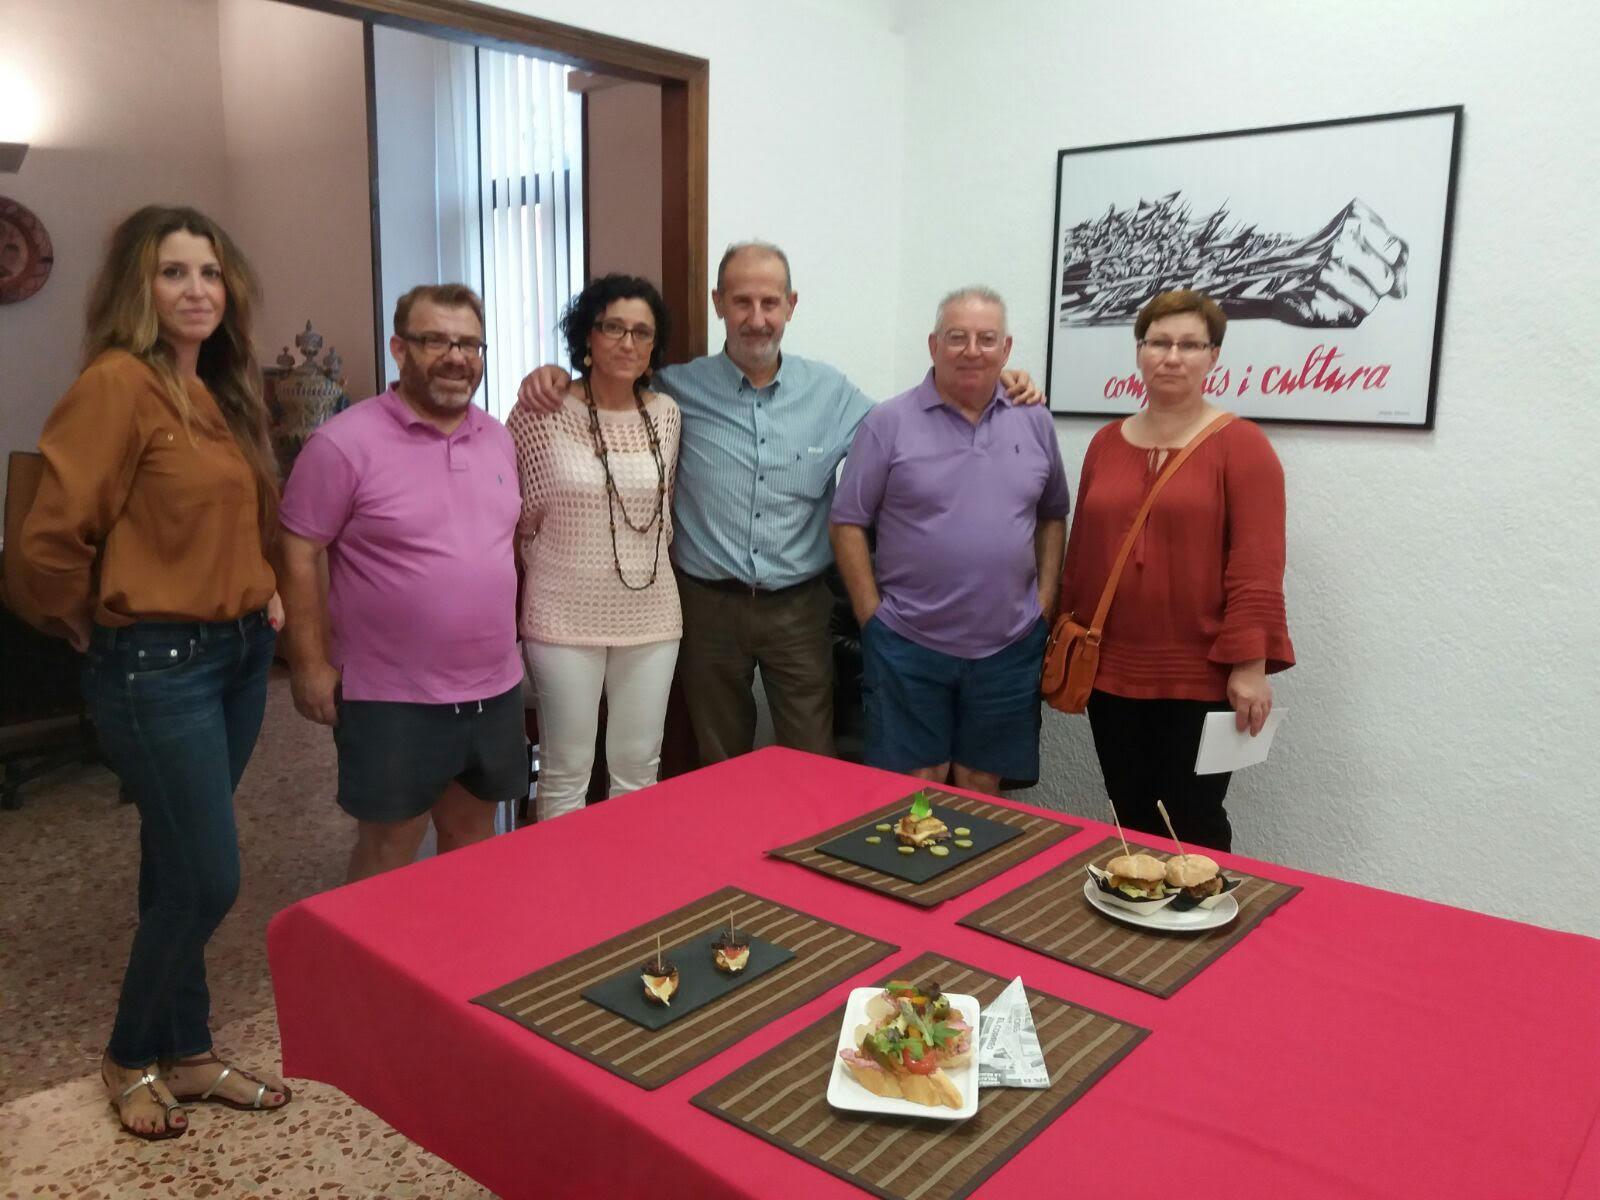 Manises celebrar la i edici n del comercio y tapas festival for Piscina cubierta almassera